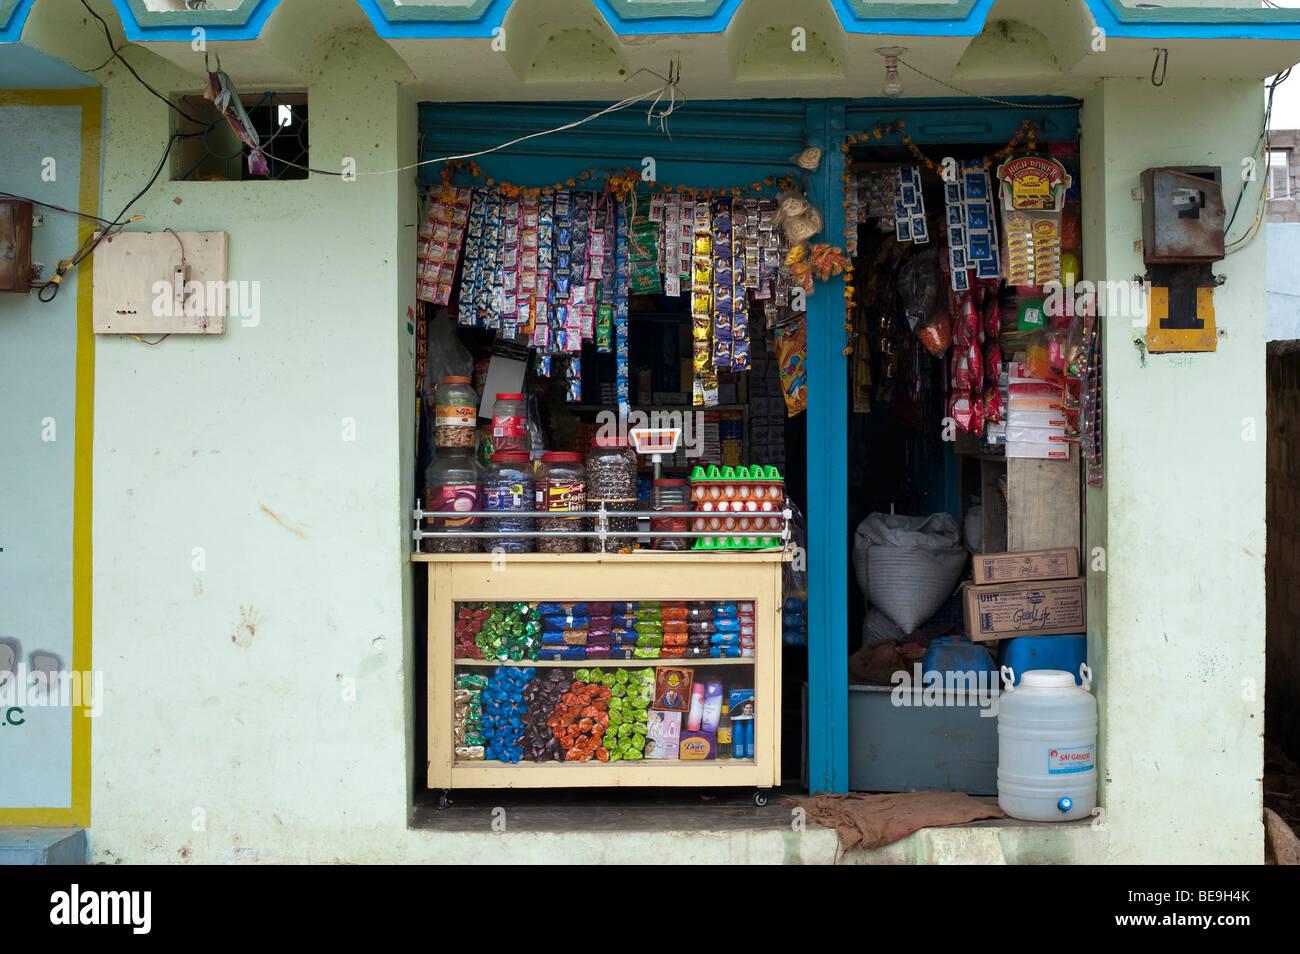 East India Food Shops